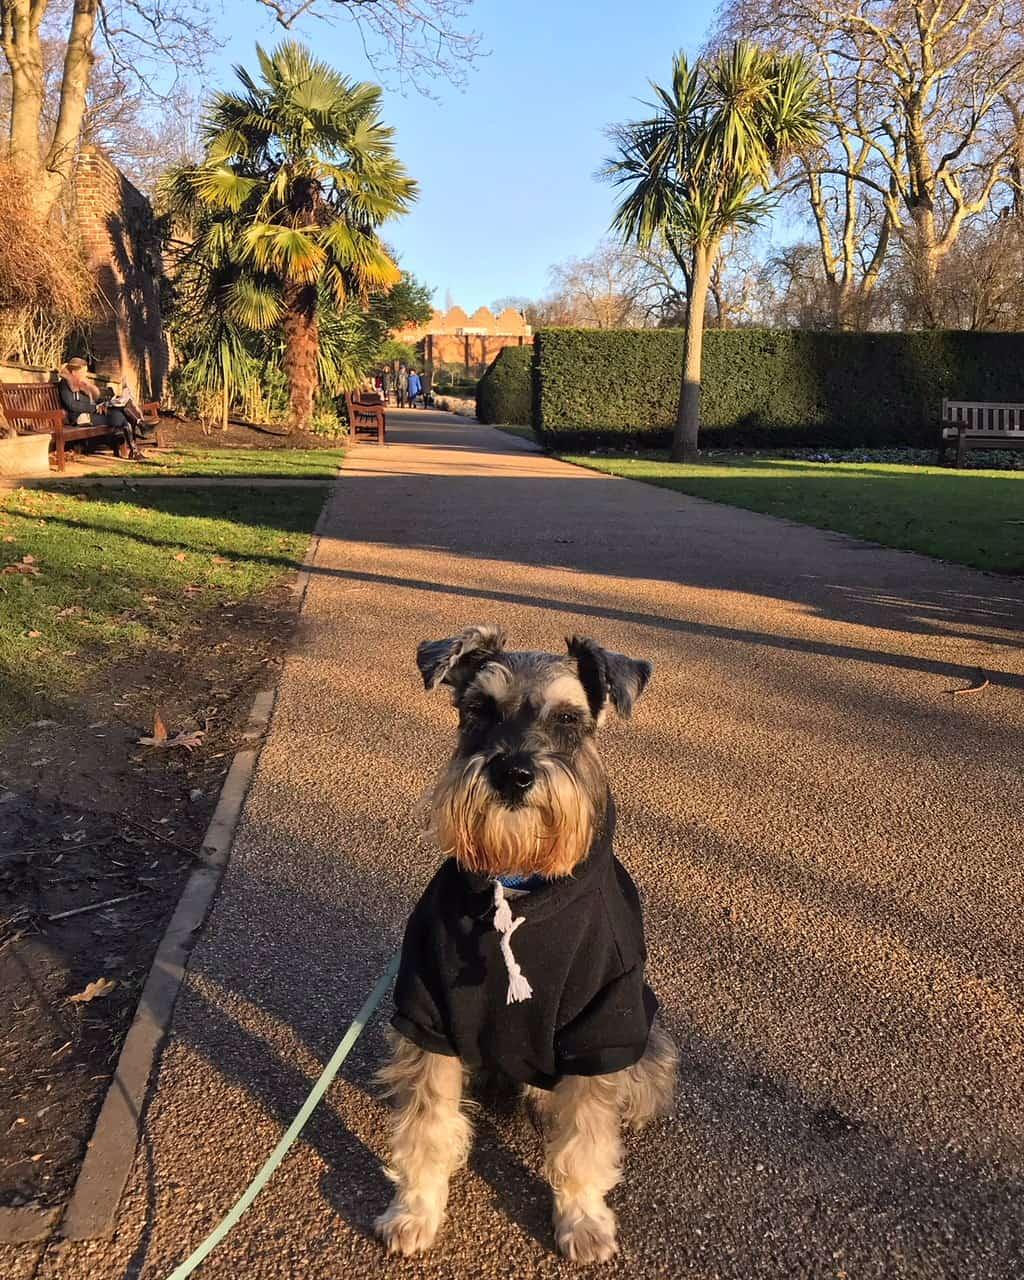 My Dog Friendly London By Pepper Chung the Schnauzer - Dog Friendly Notting Hill 18